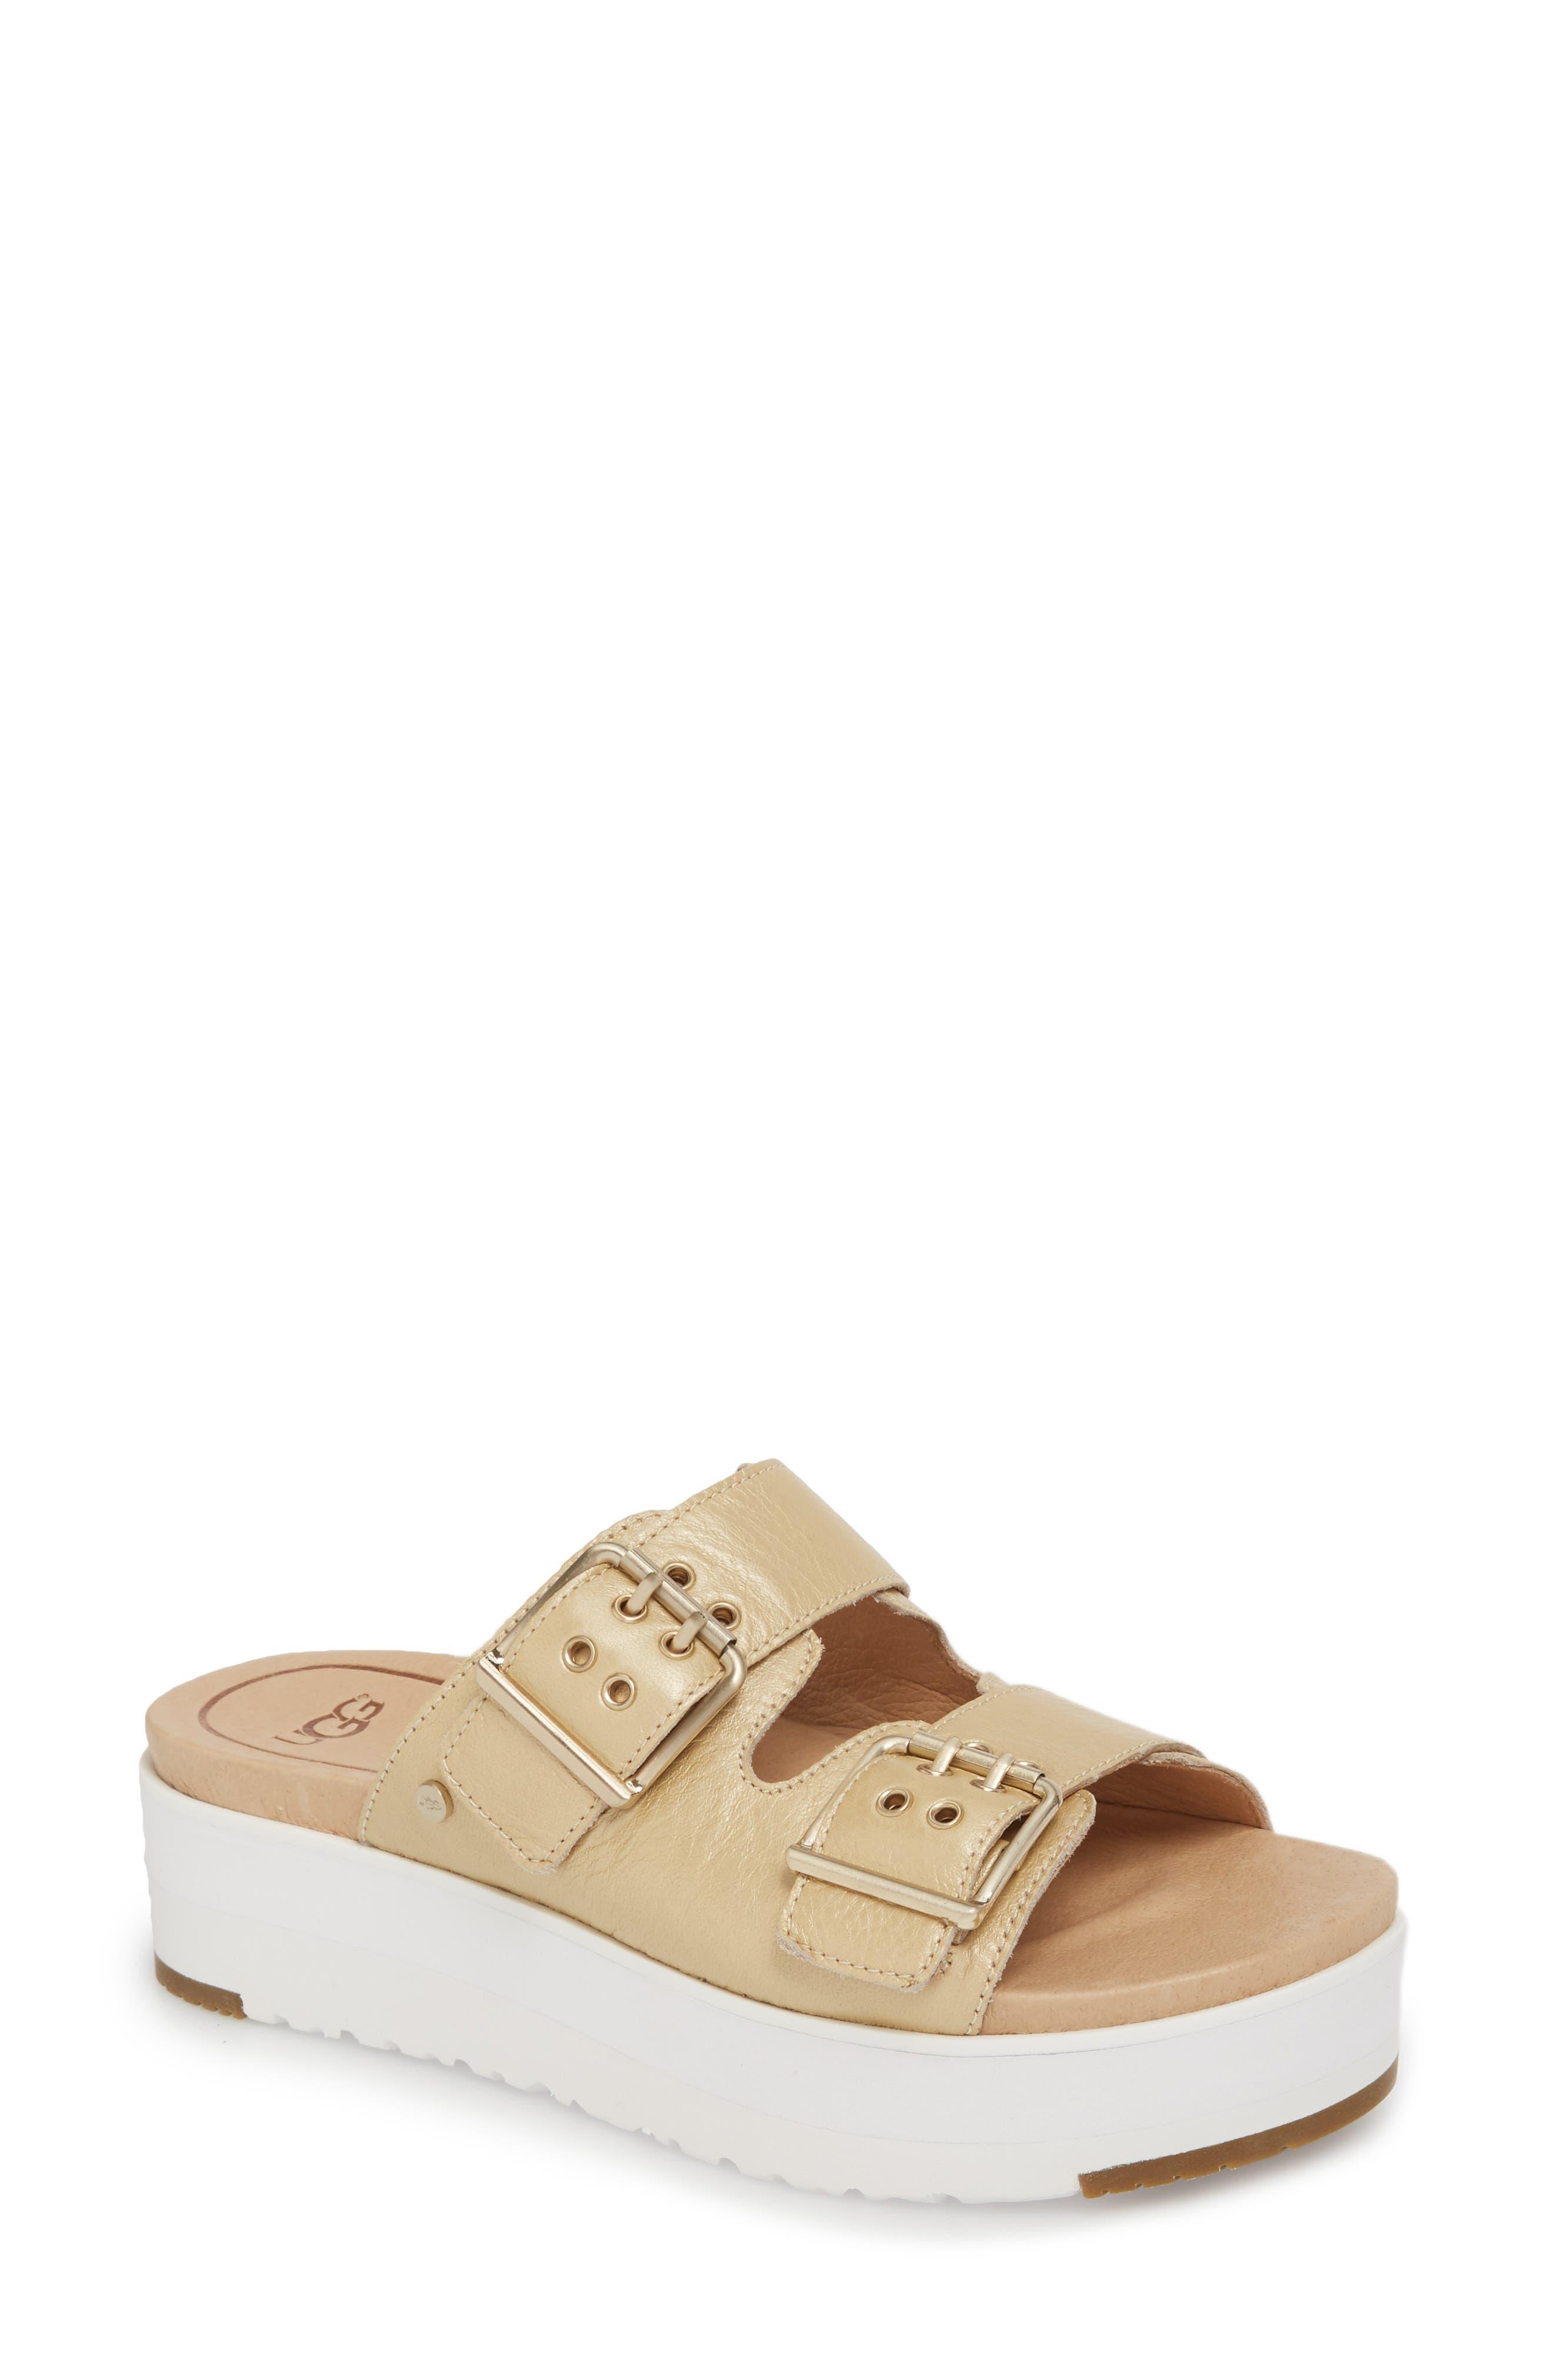 Cammie Platform Sandal,                         Main,                         color, Gold Patent Leather